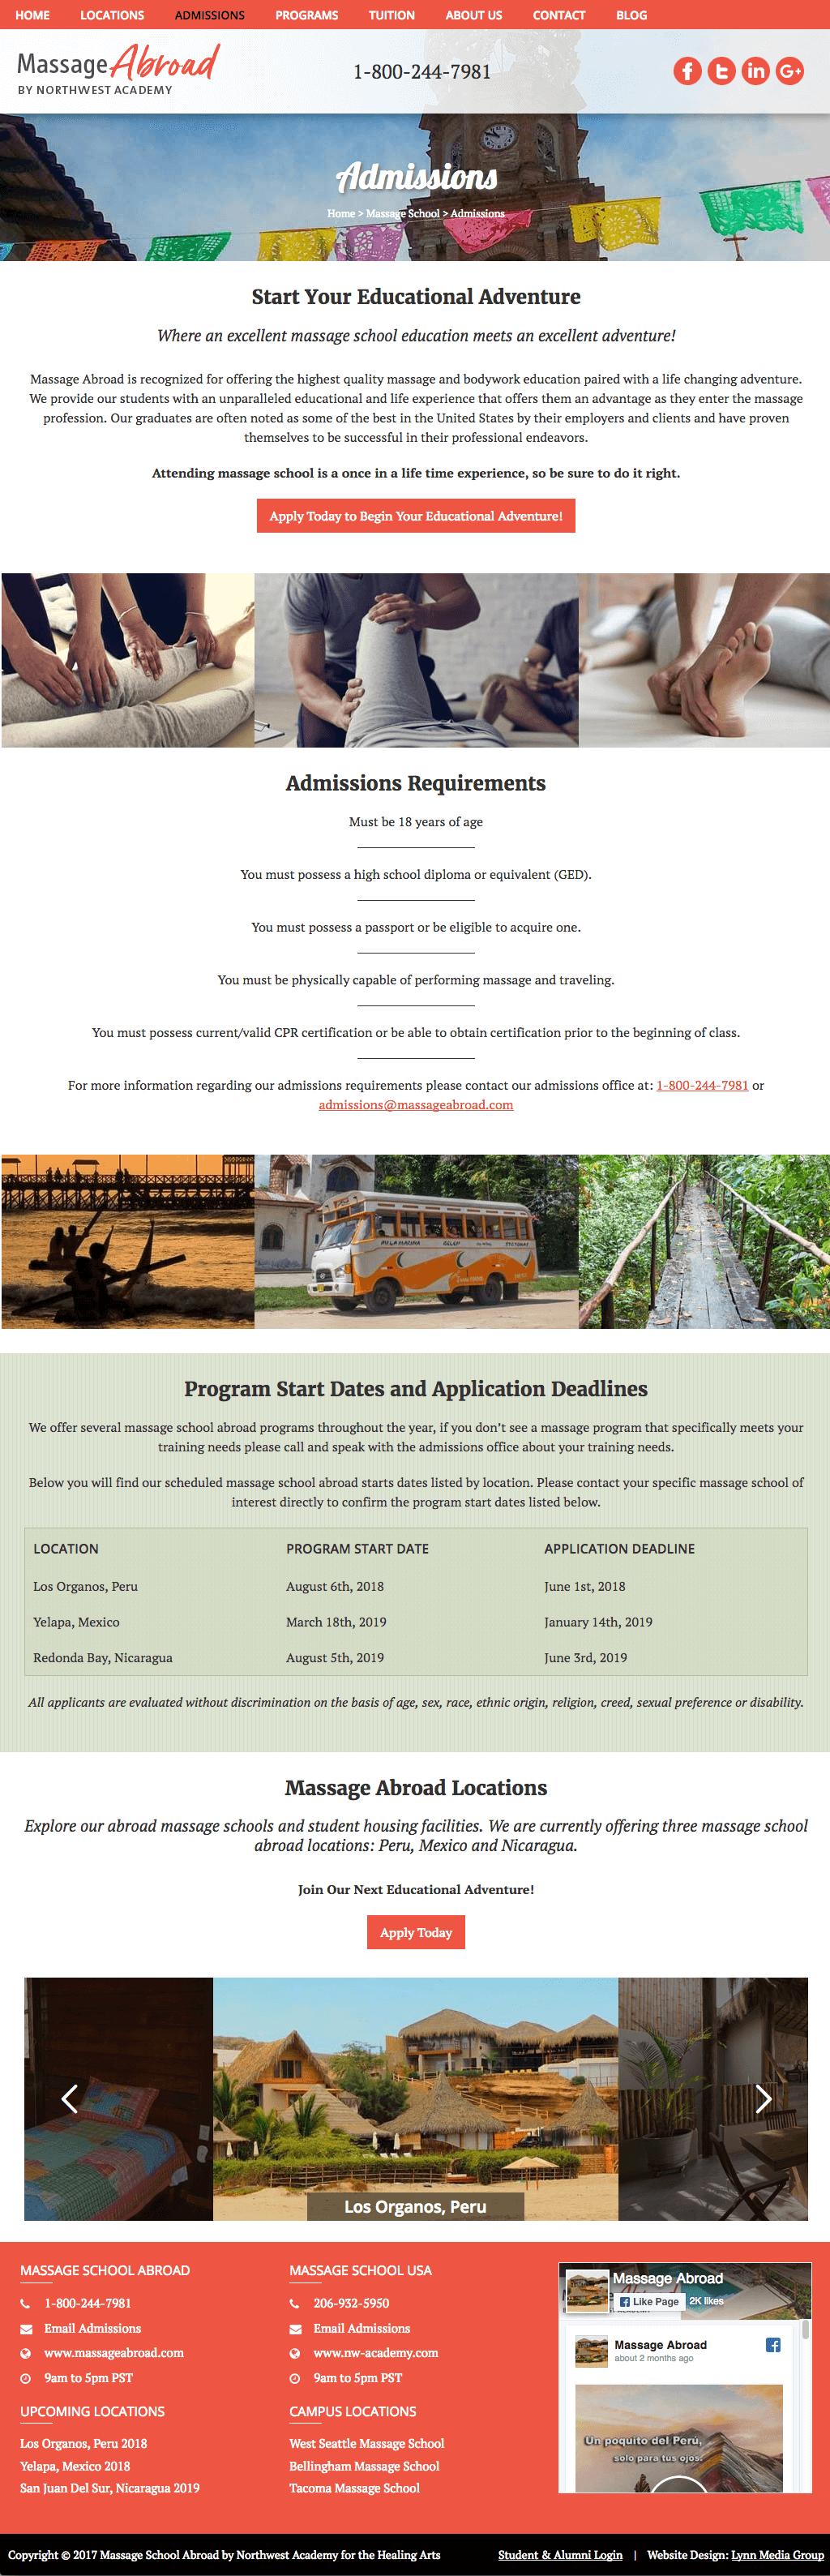 education abroad program website design